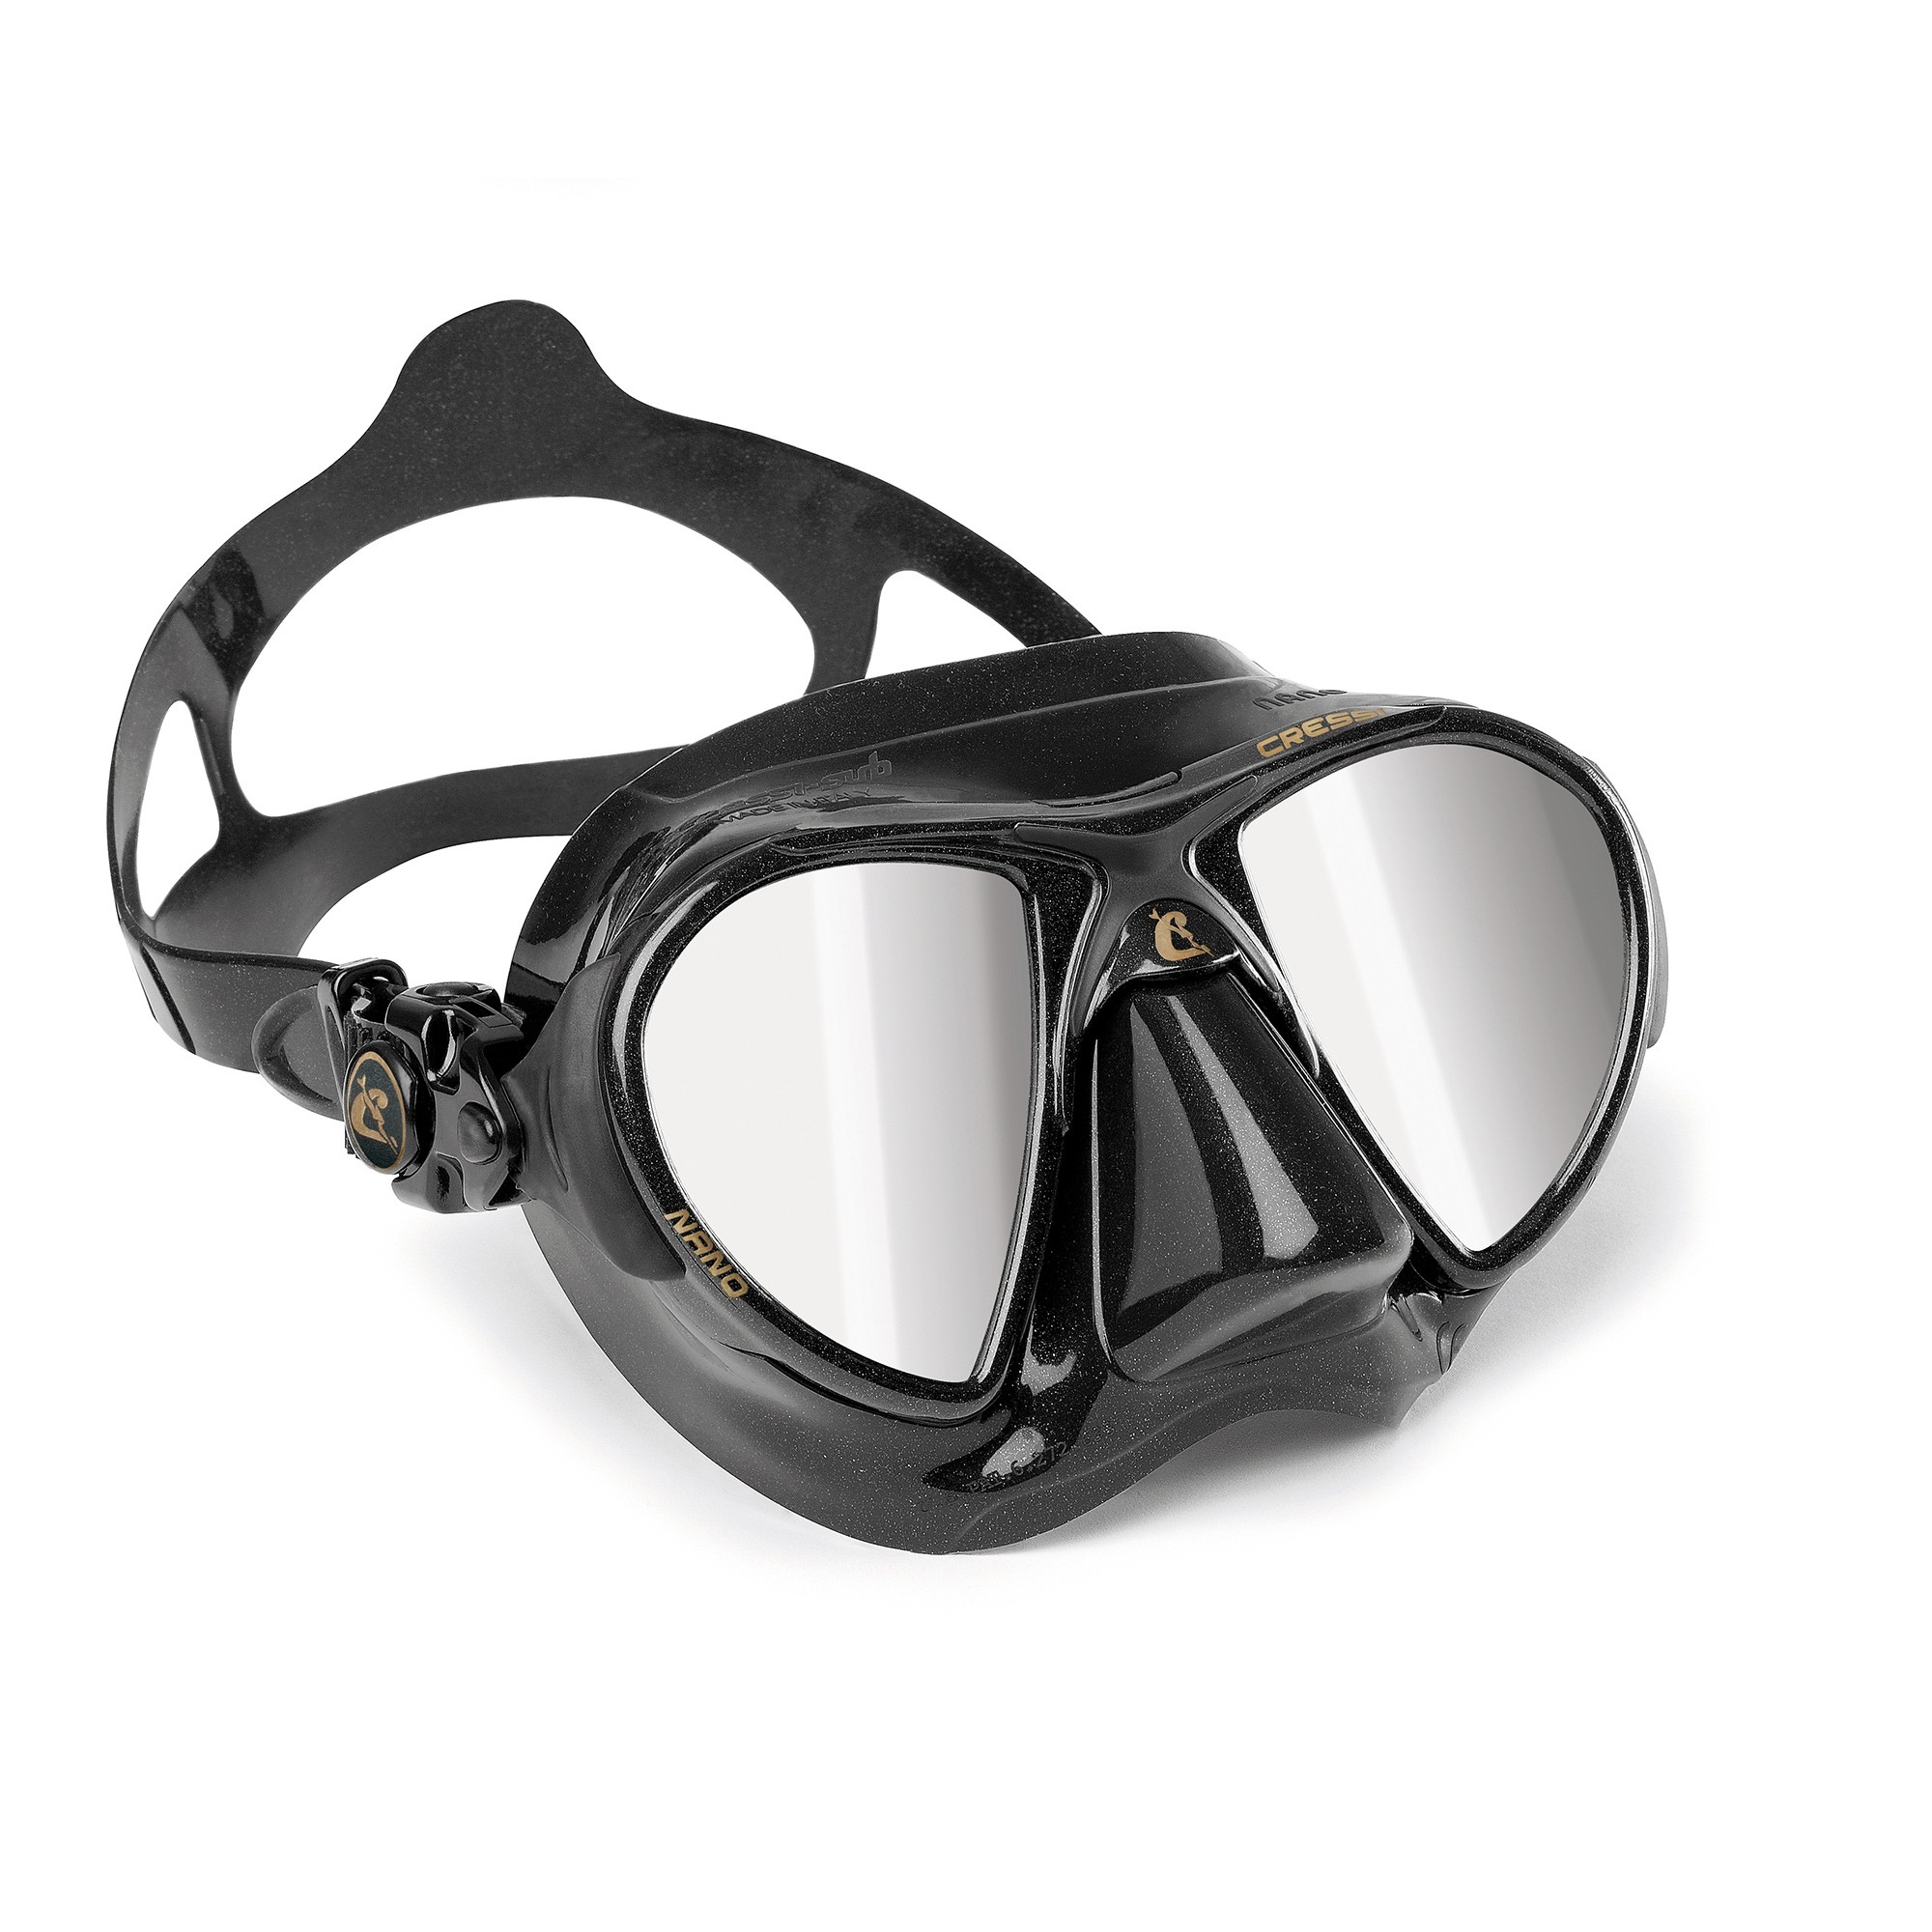 Cressi Nano Black Mirrored Mask